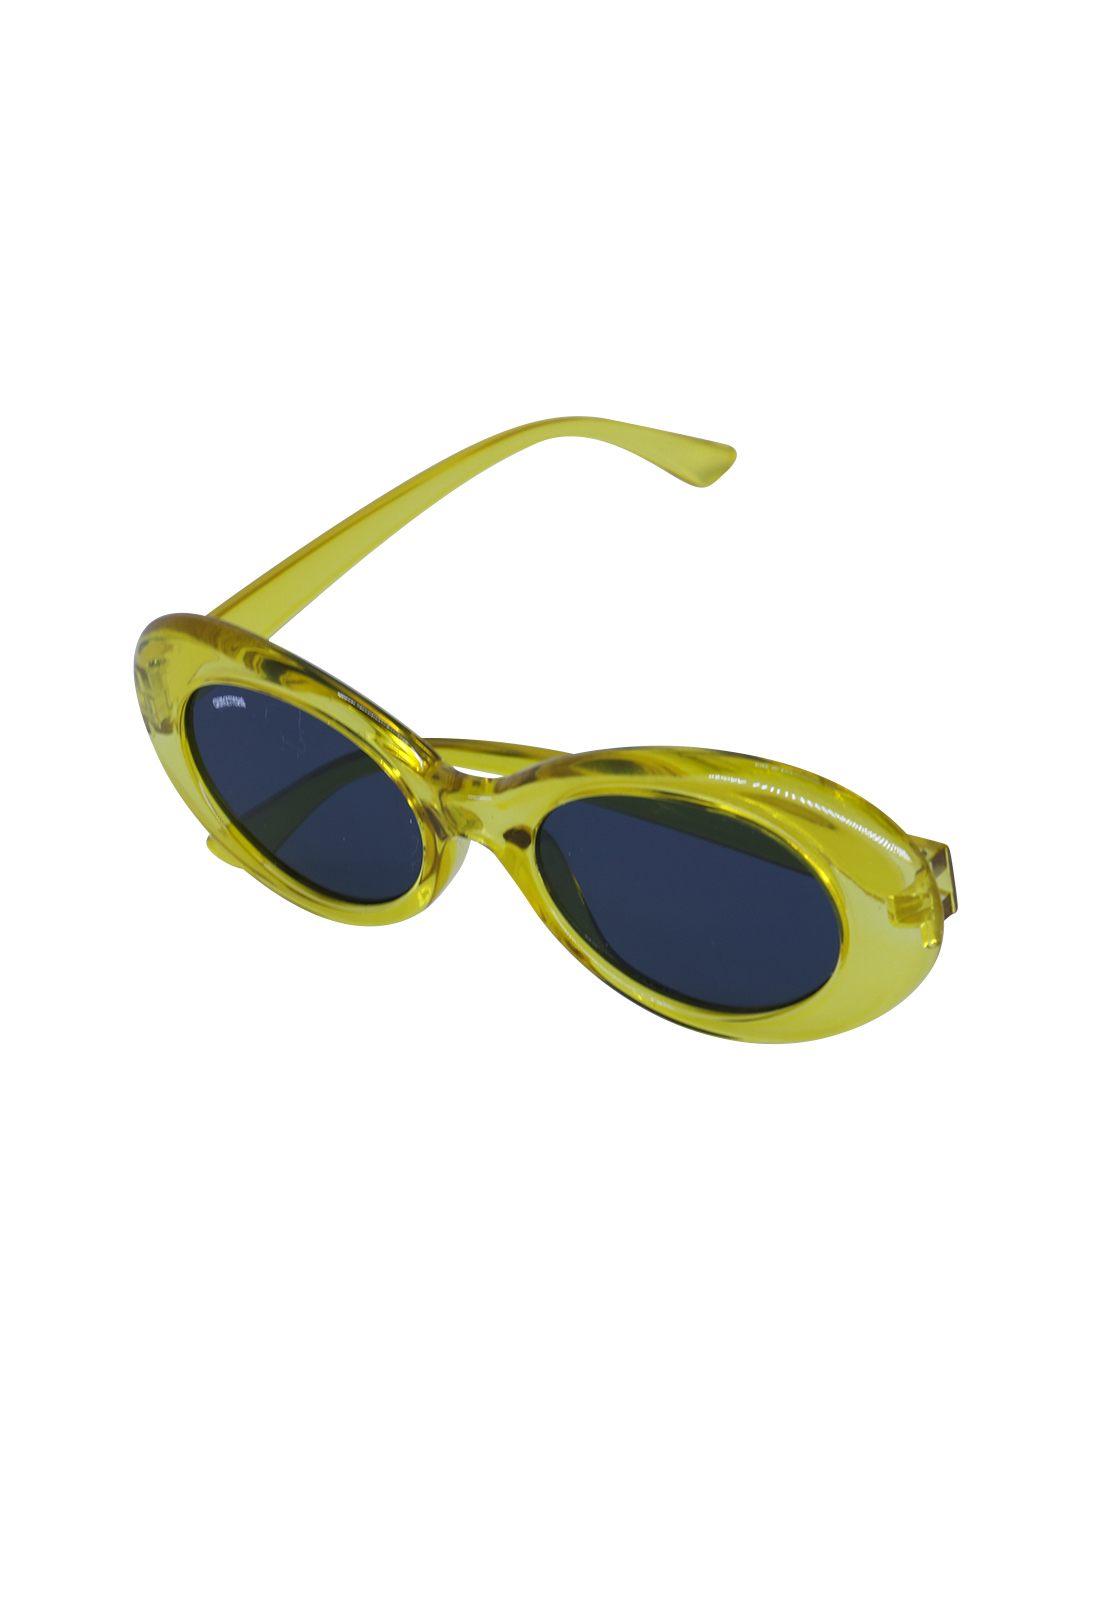 Óculos de Sol Grungetteria Kurt Sol